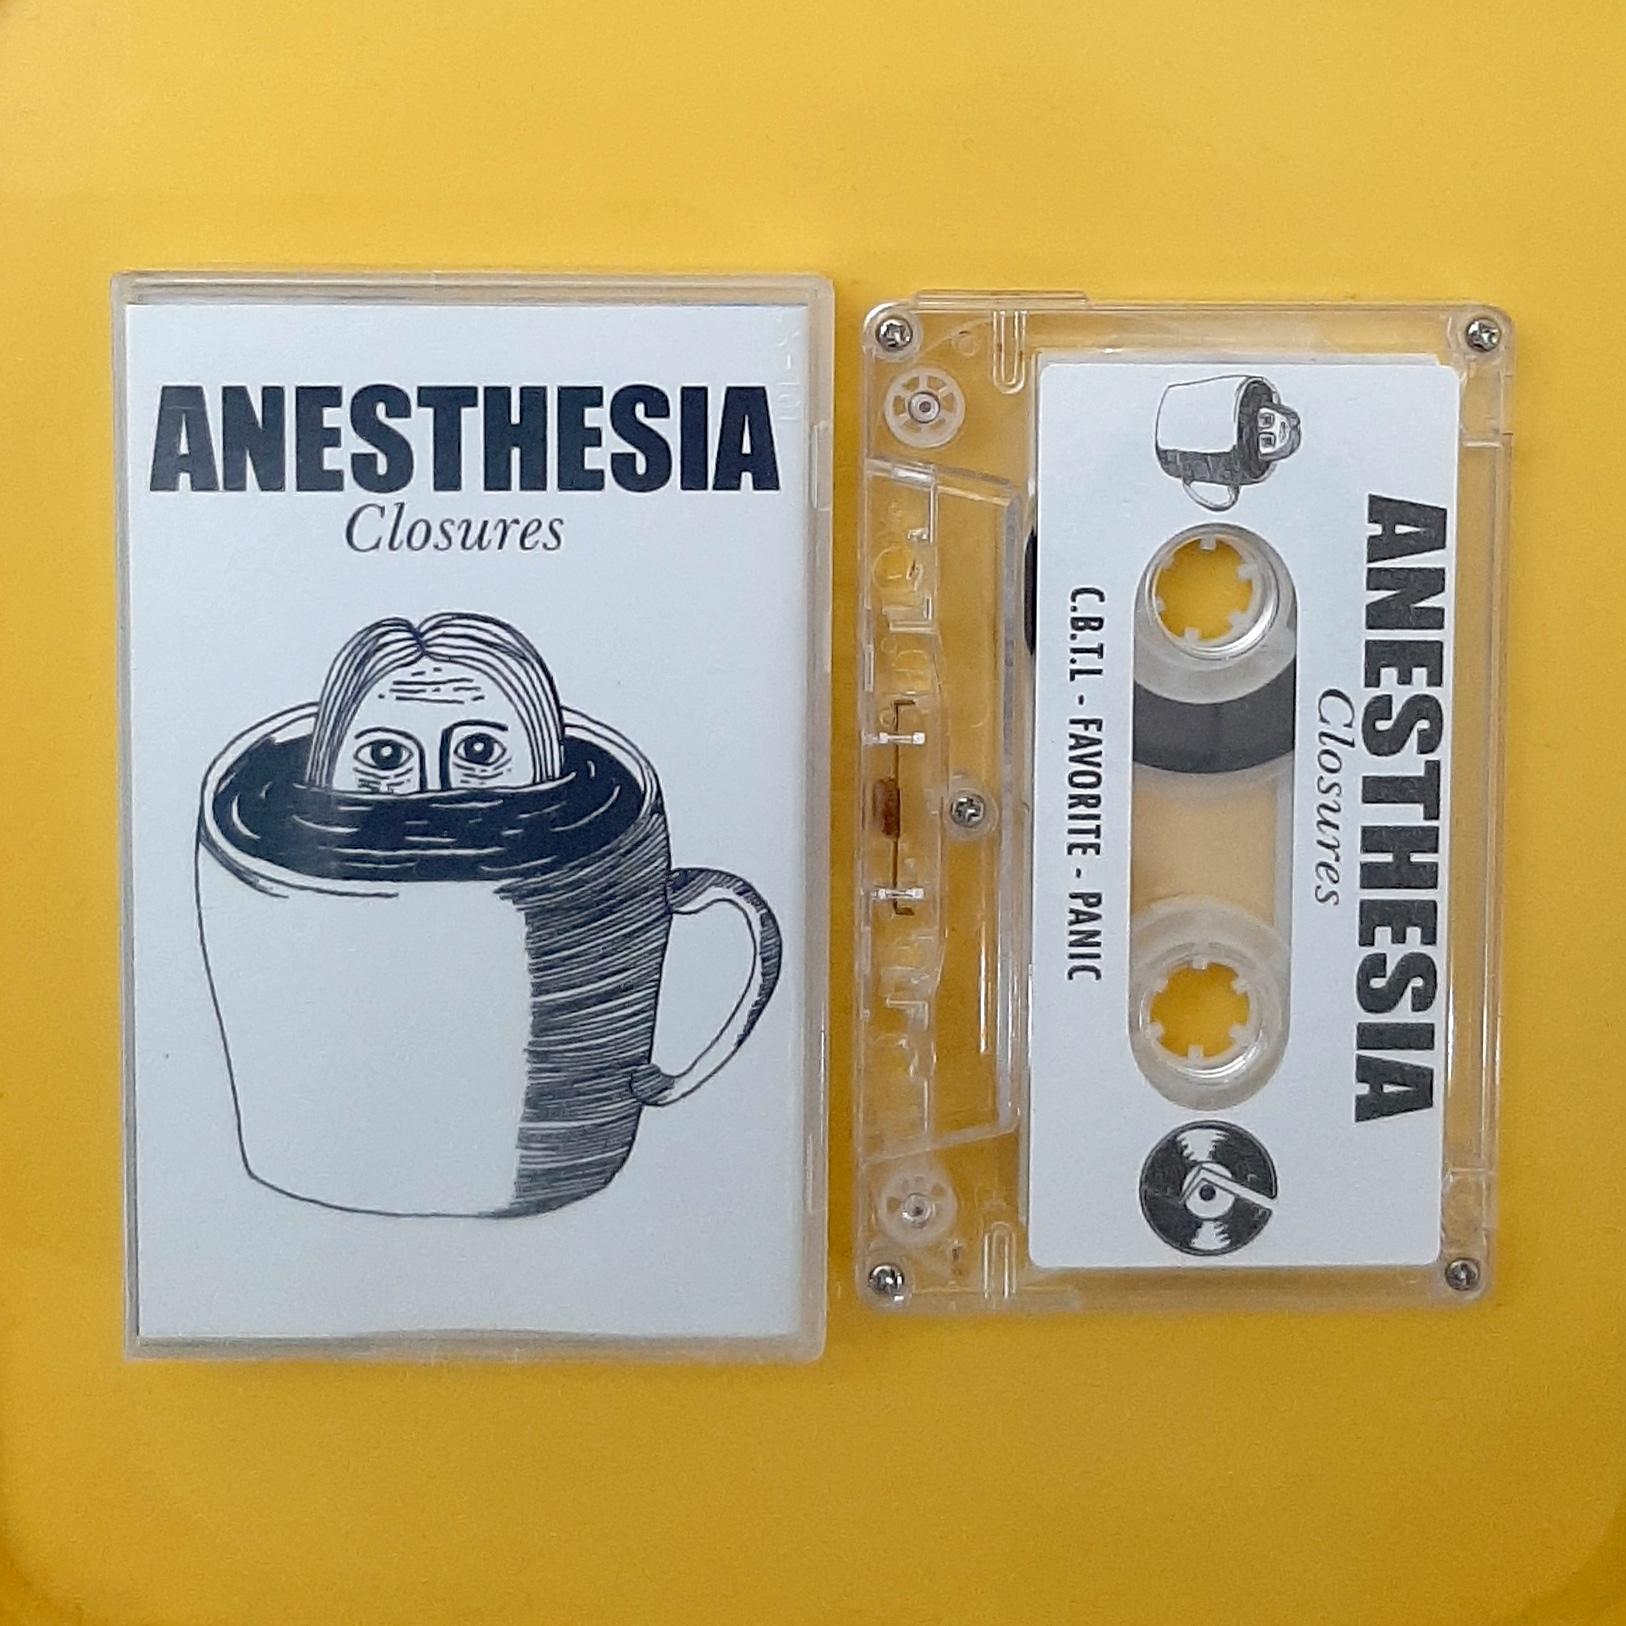 Anesthesia - Closures (Struggle Records)